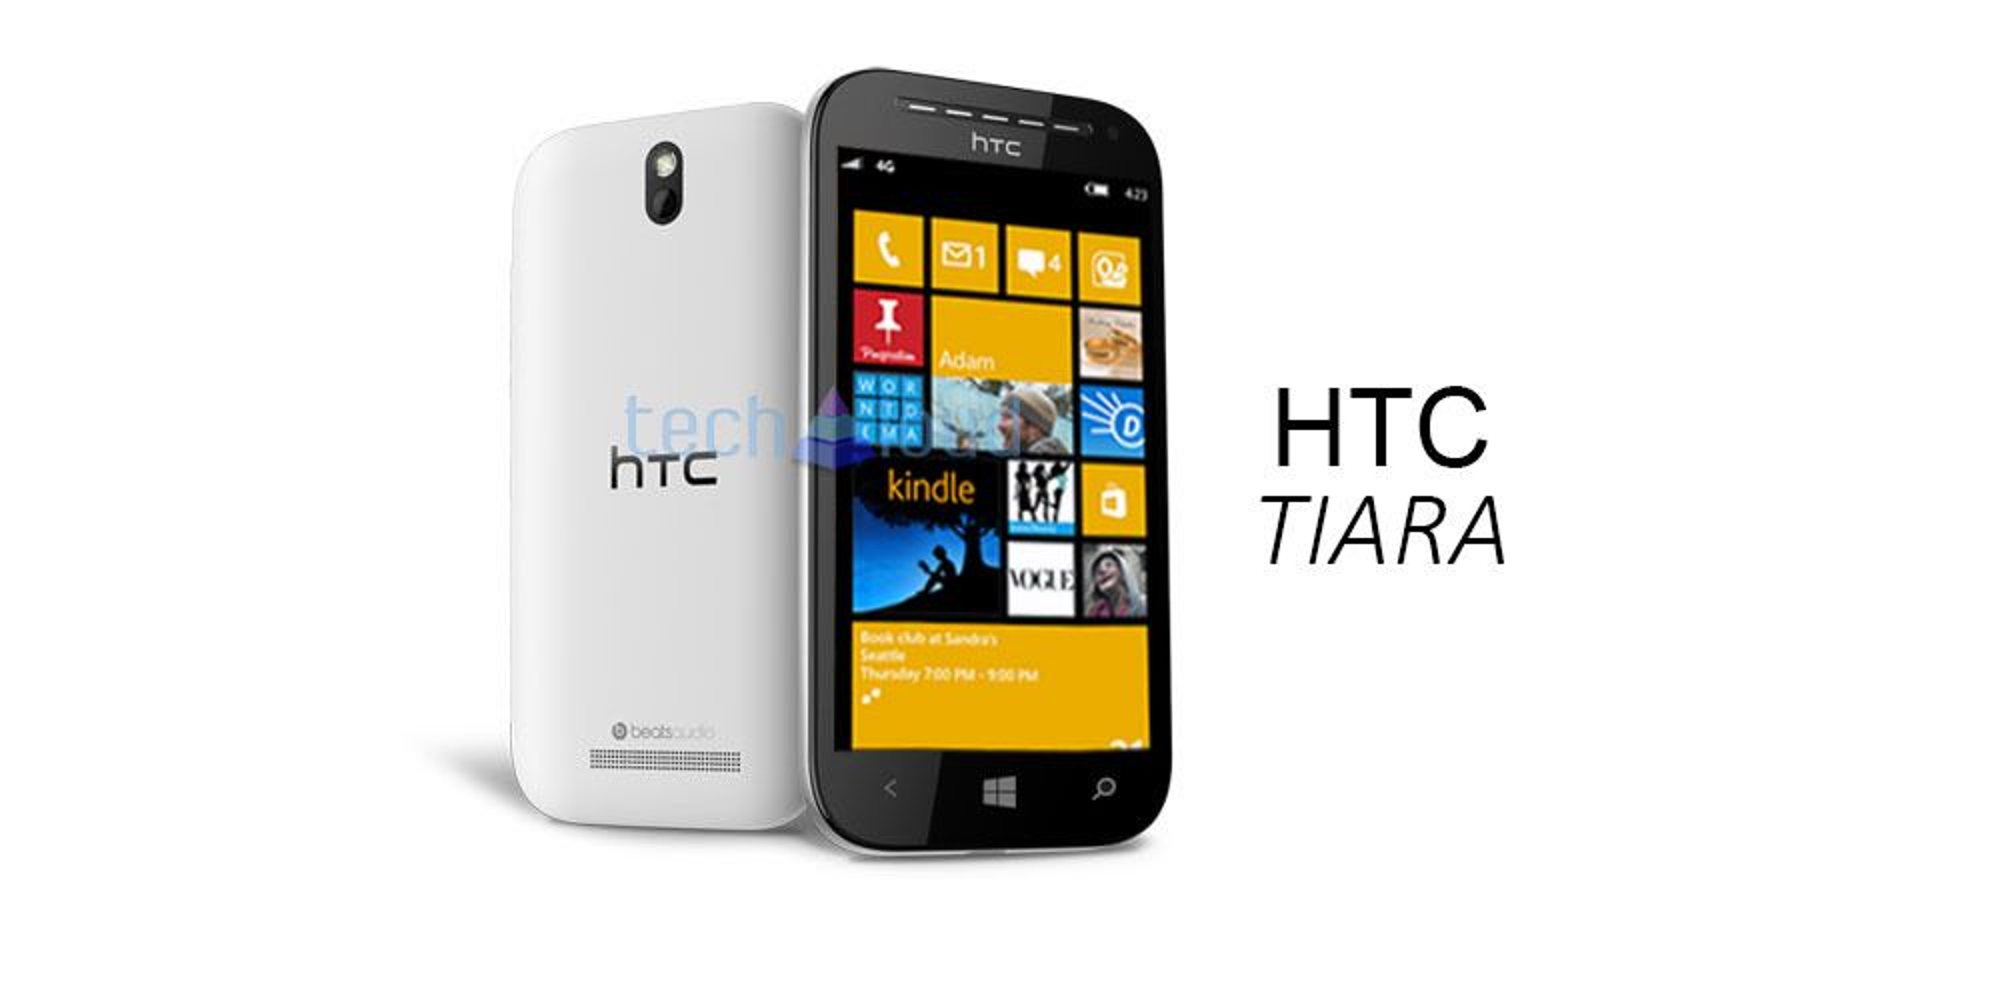 TEST: Her er HTC Tiara